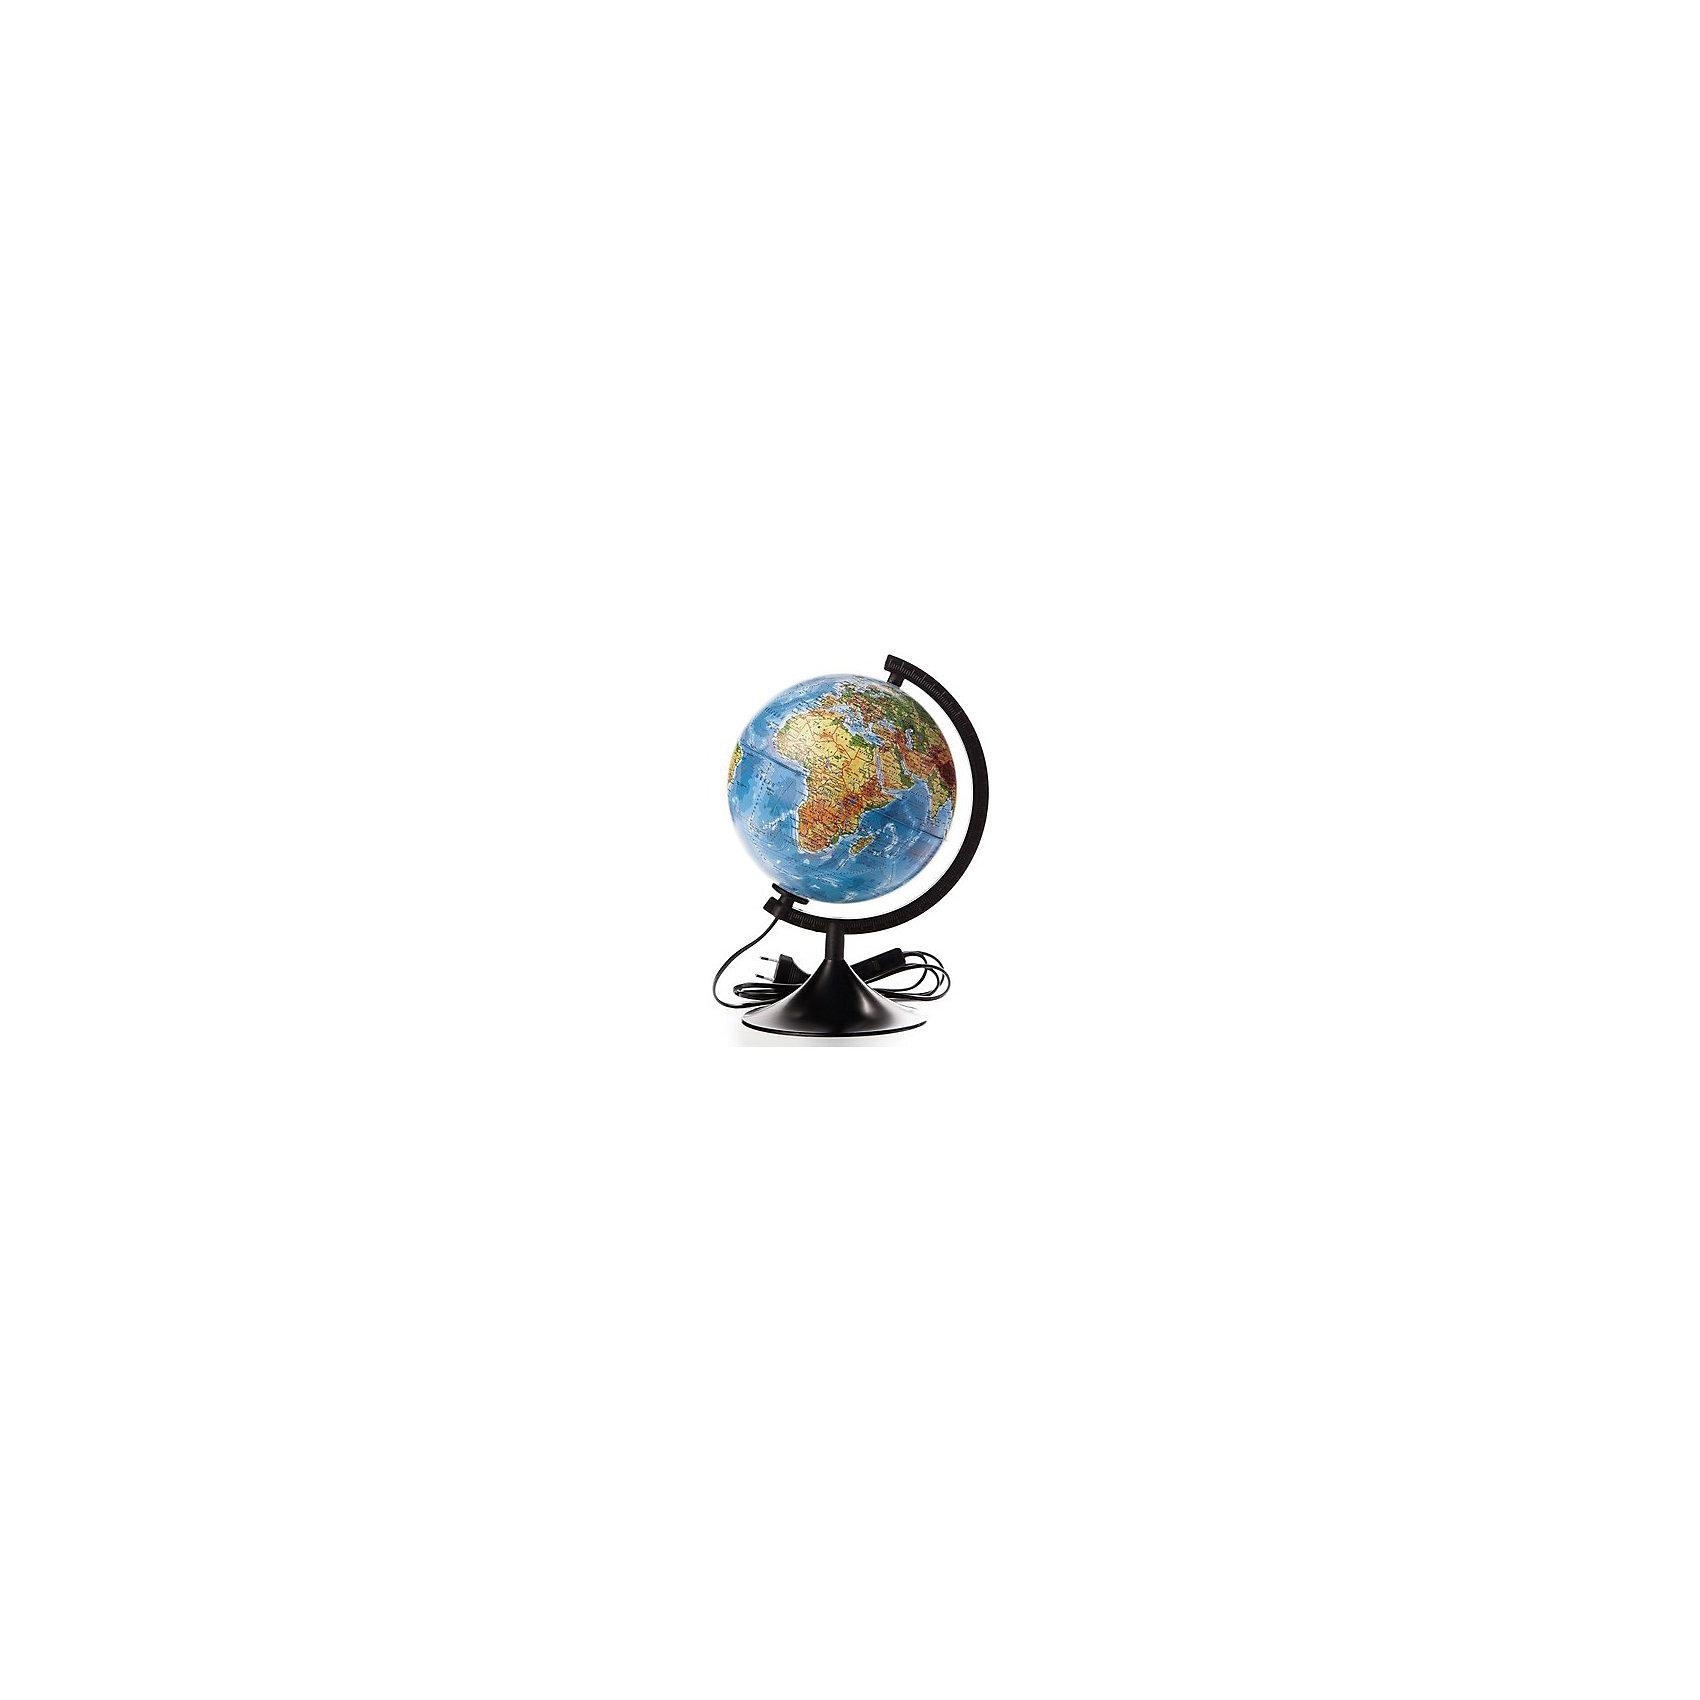 Глобус Земли физический с подсветкой, диаметр 320 ммГлобус Земли д-р 320 физический с подсветкой<br><br>Ширина мм: 350<br>Глубина мм: 320<br>Высота мм: 320<br>Вес г: 900<br>Возраст от месяцев: 72<br>Возраст до месяцев: 2147483647<br>Пол: Унисекс<br>Возраст: Детский<br>SKU: 5504476